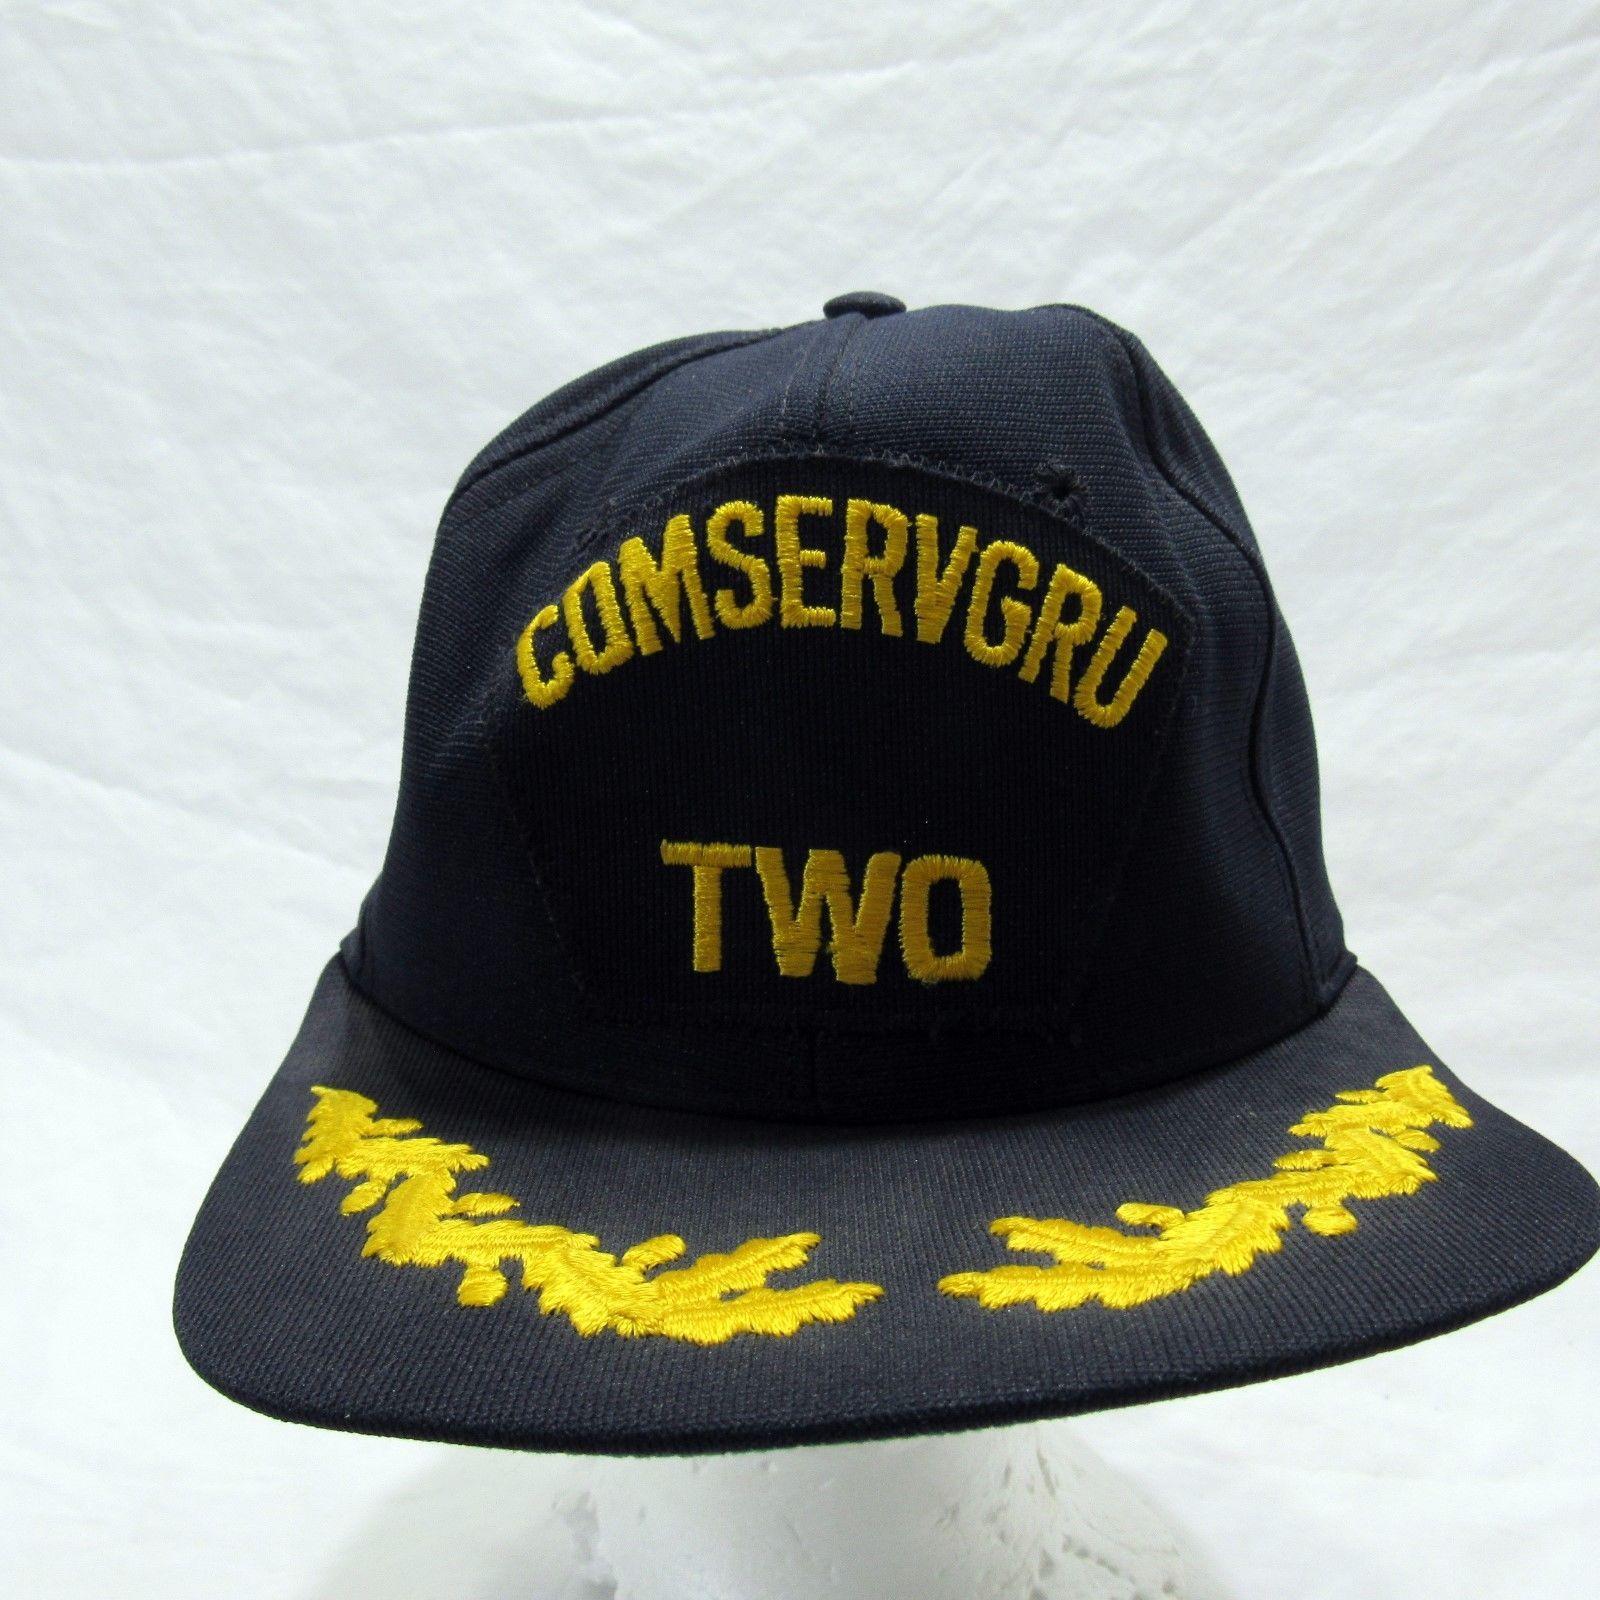 607680aa8b230 Comservgru Two Snap Back Cap Hat New Era and 50 similar items